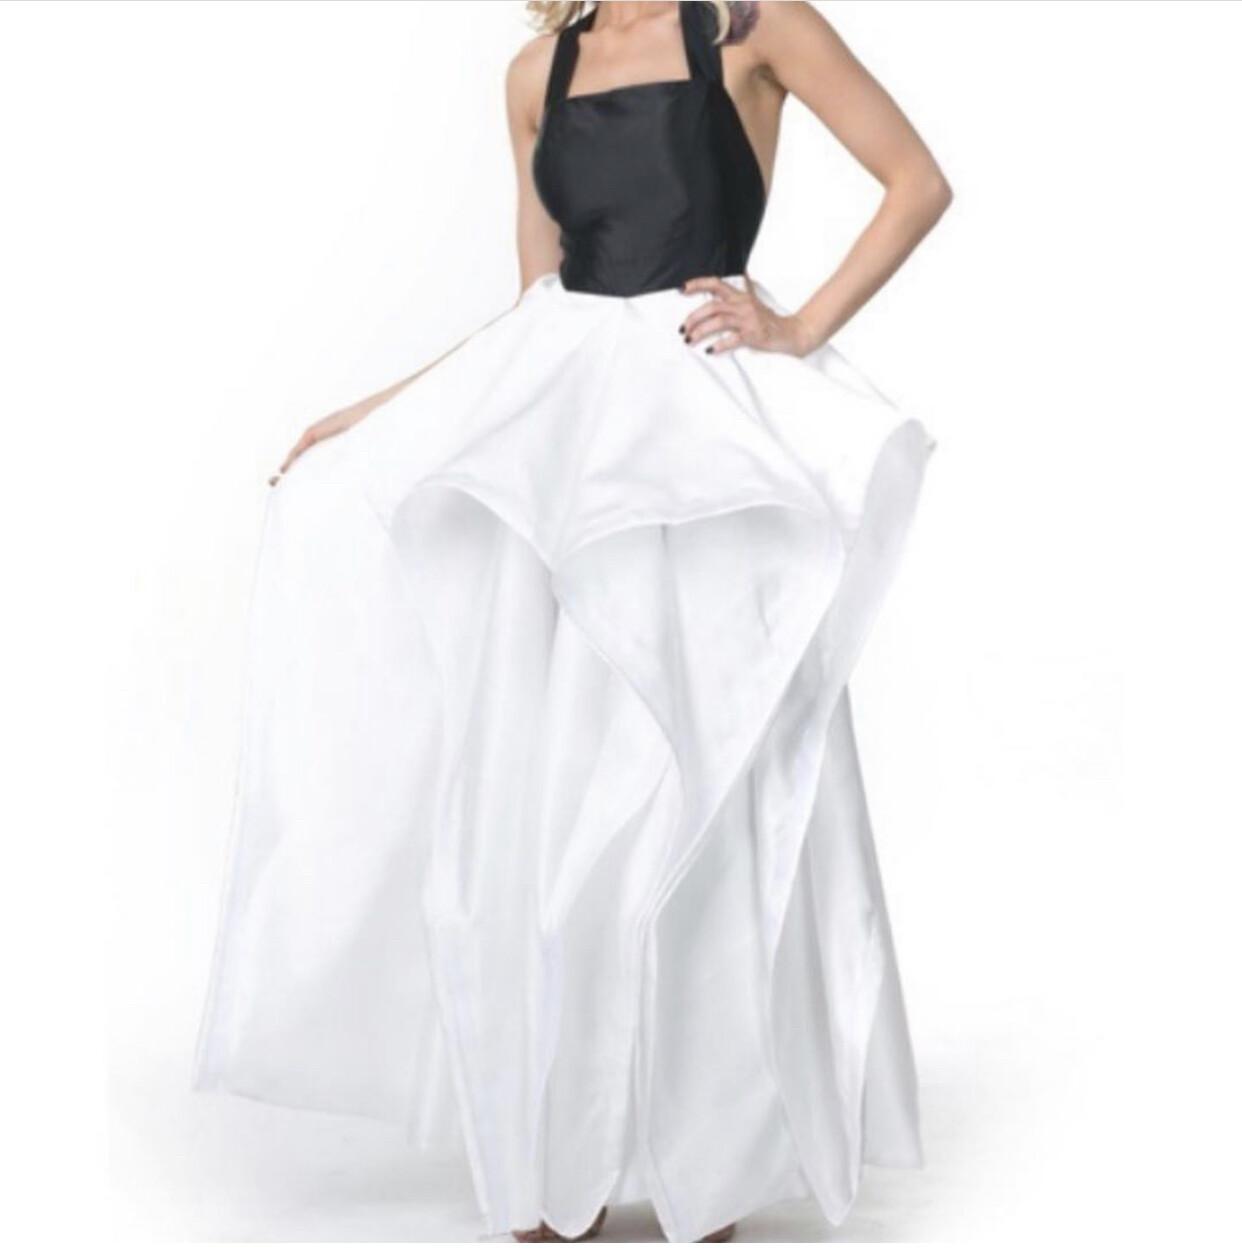 It's a Ball Dress